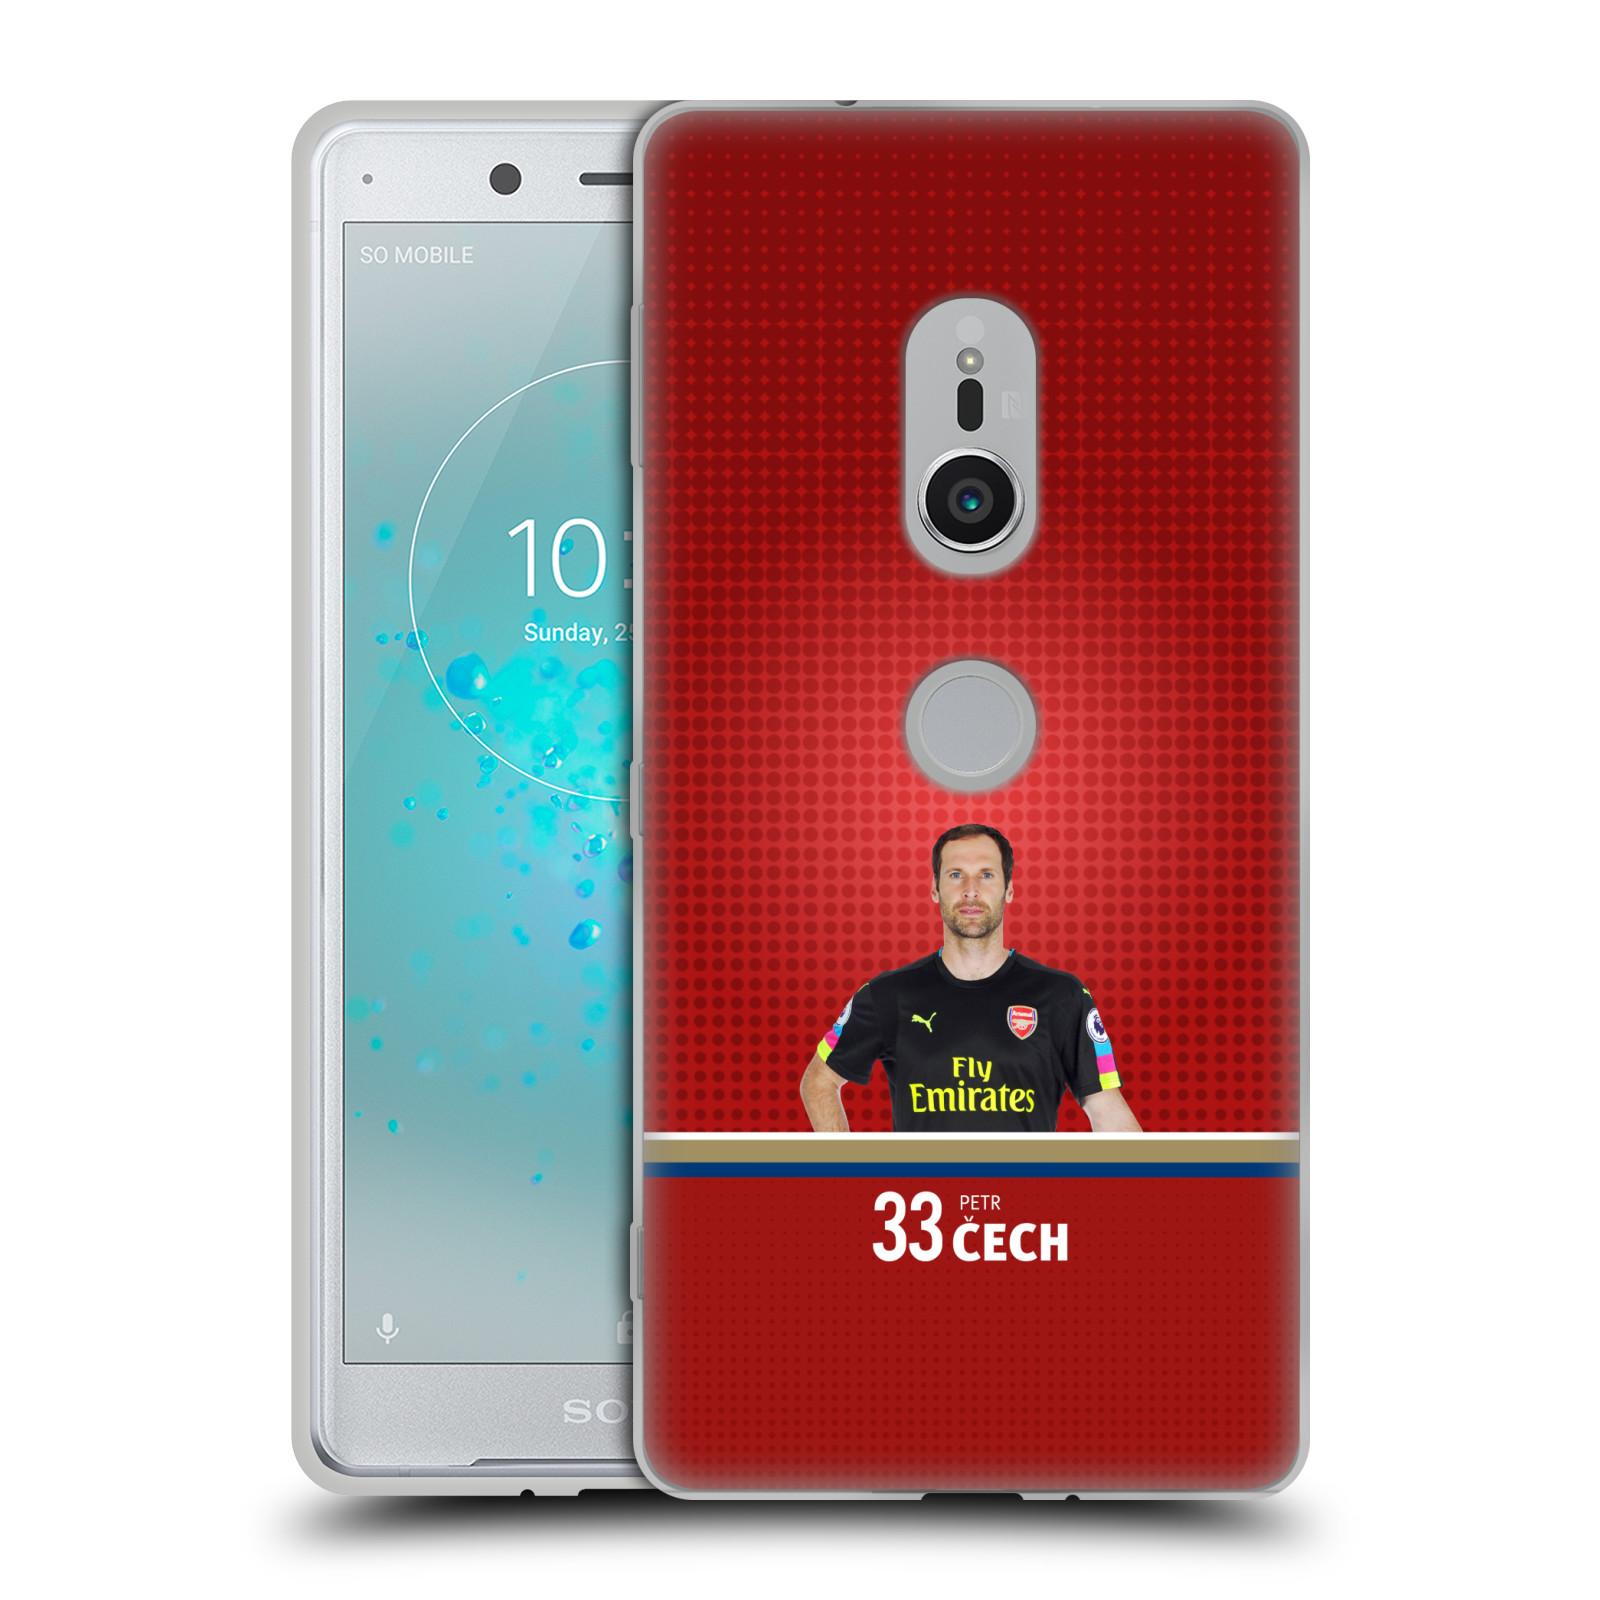 Silikonové pouzdro na mobil Sony Xperia XZ2 - Head Case - Arsenal FC - Petr Čech